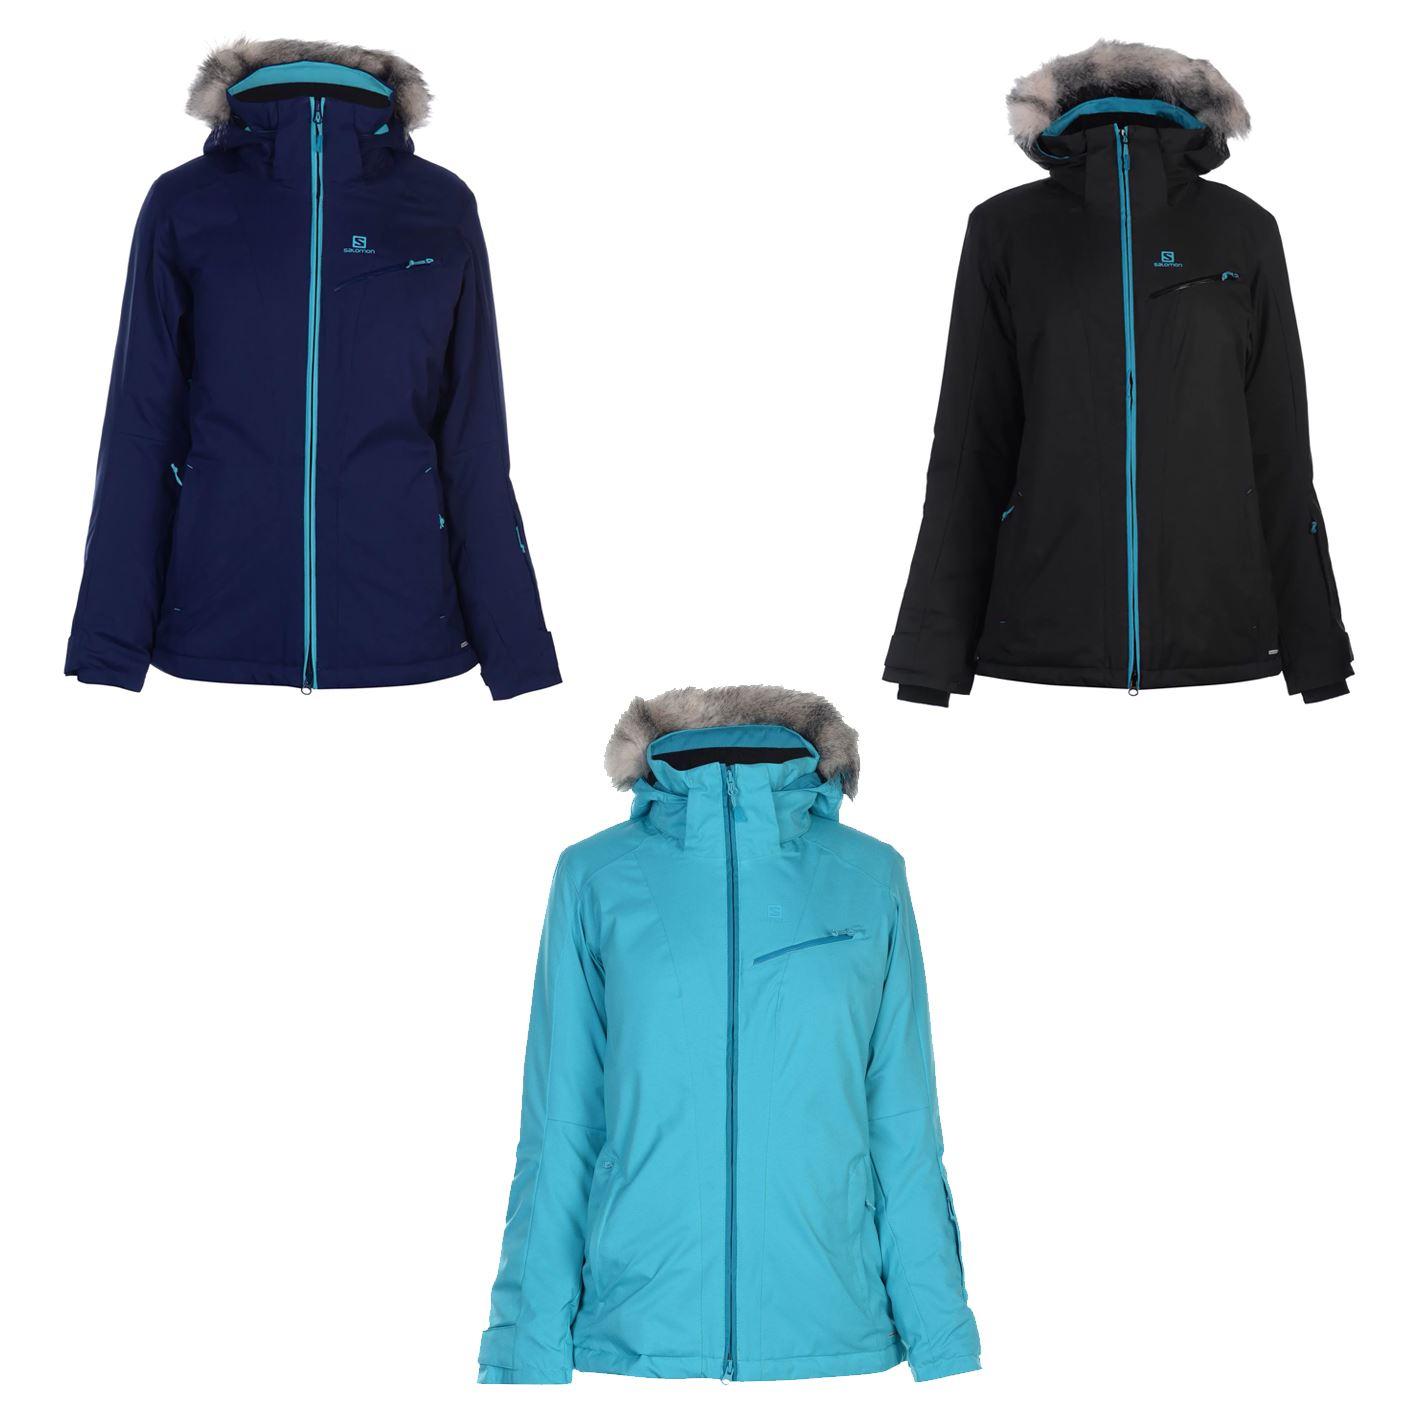 Details about Salomon Rise Ski Jacket Womens Outdoor Top Ladies Outerwear